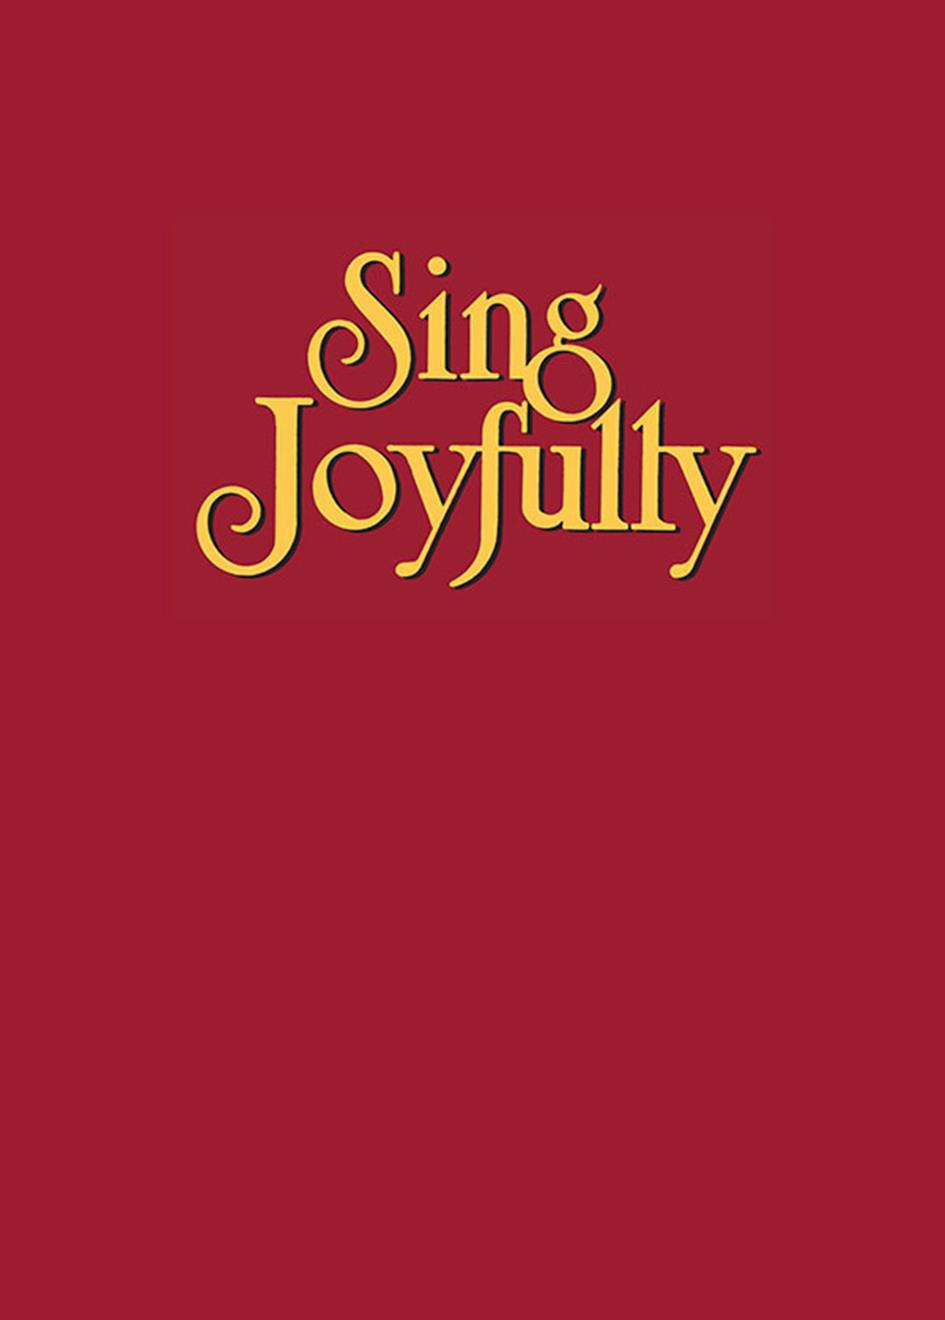 Sing Joyfully - Spiral-bound edition Cover Image